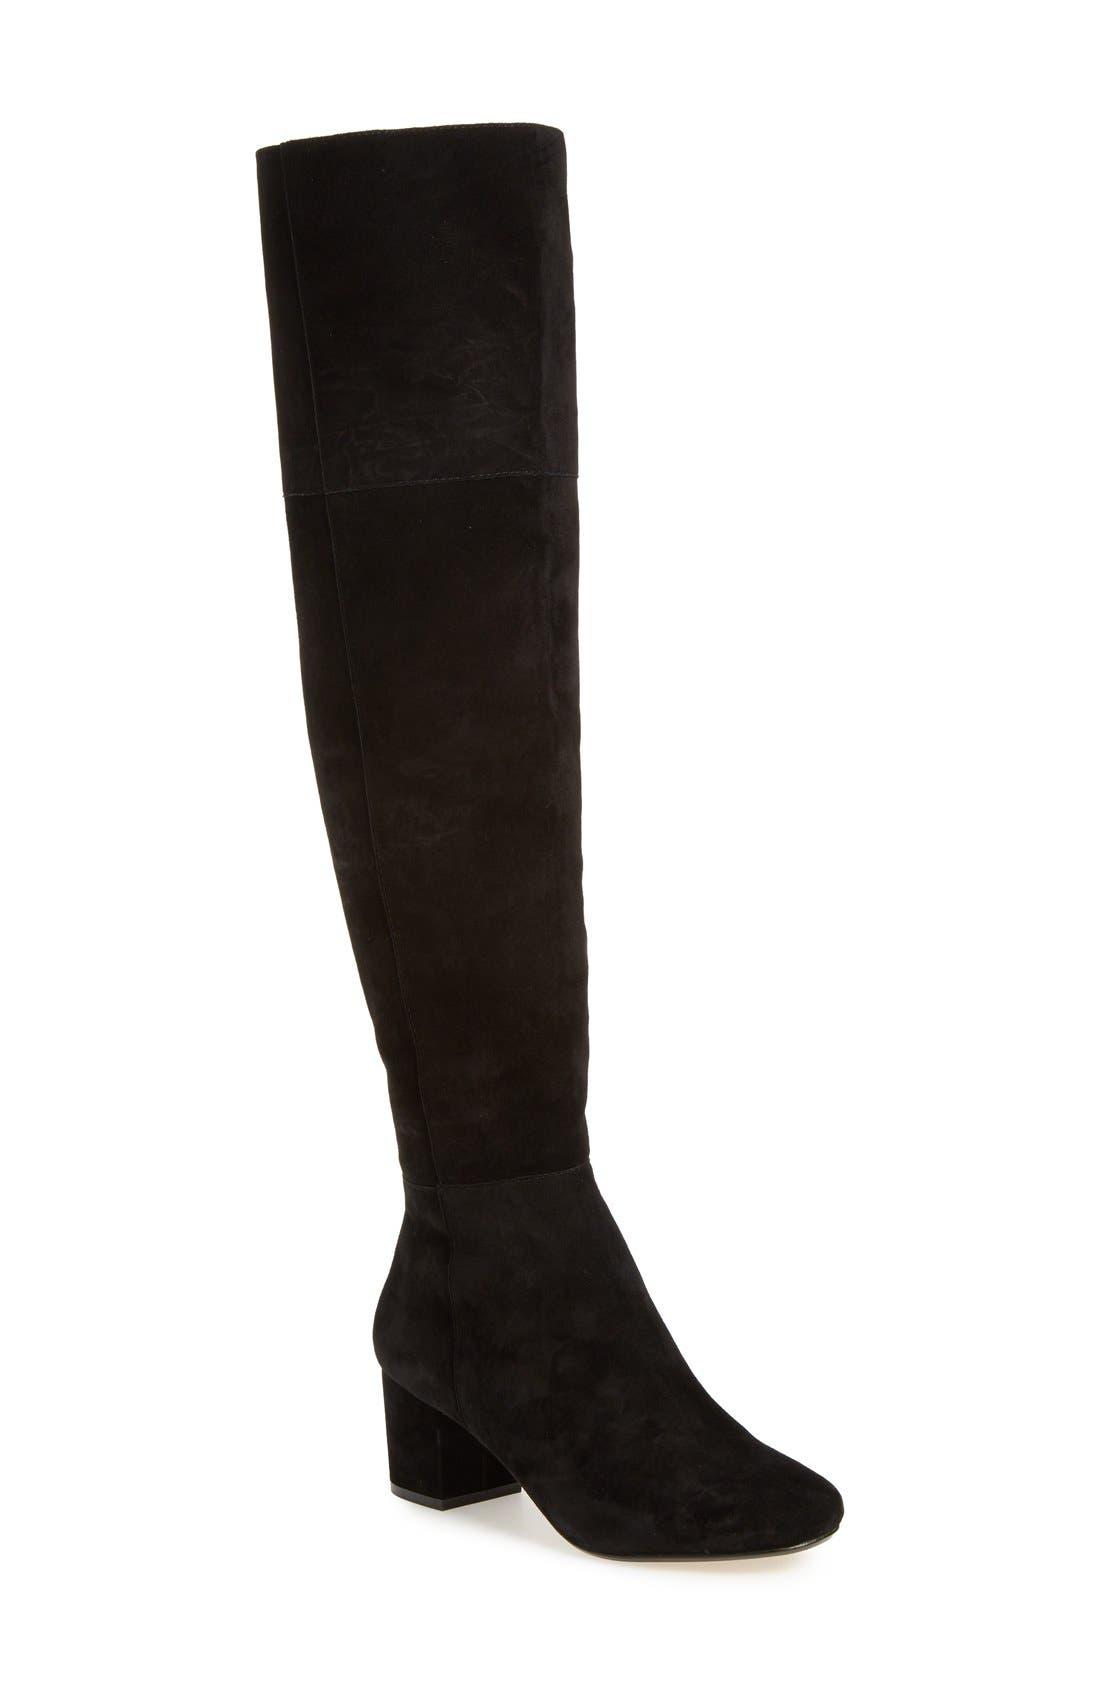 Main Image - Dune London 'Sanford' Tall Boot (Women)